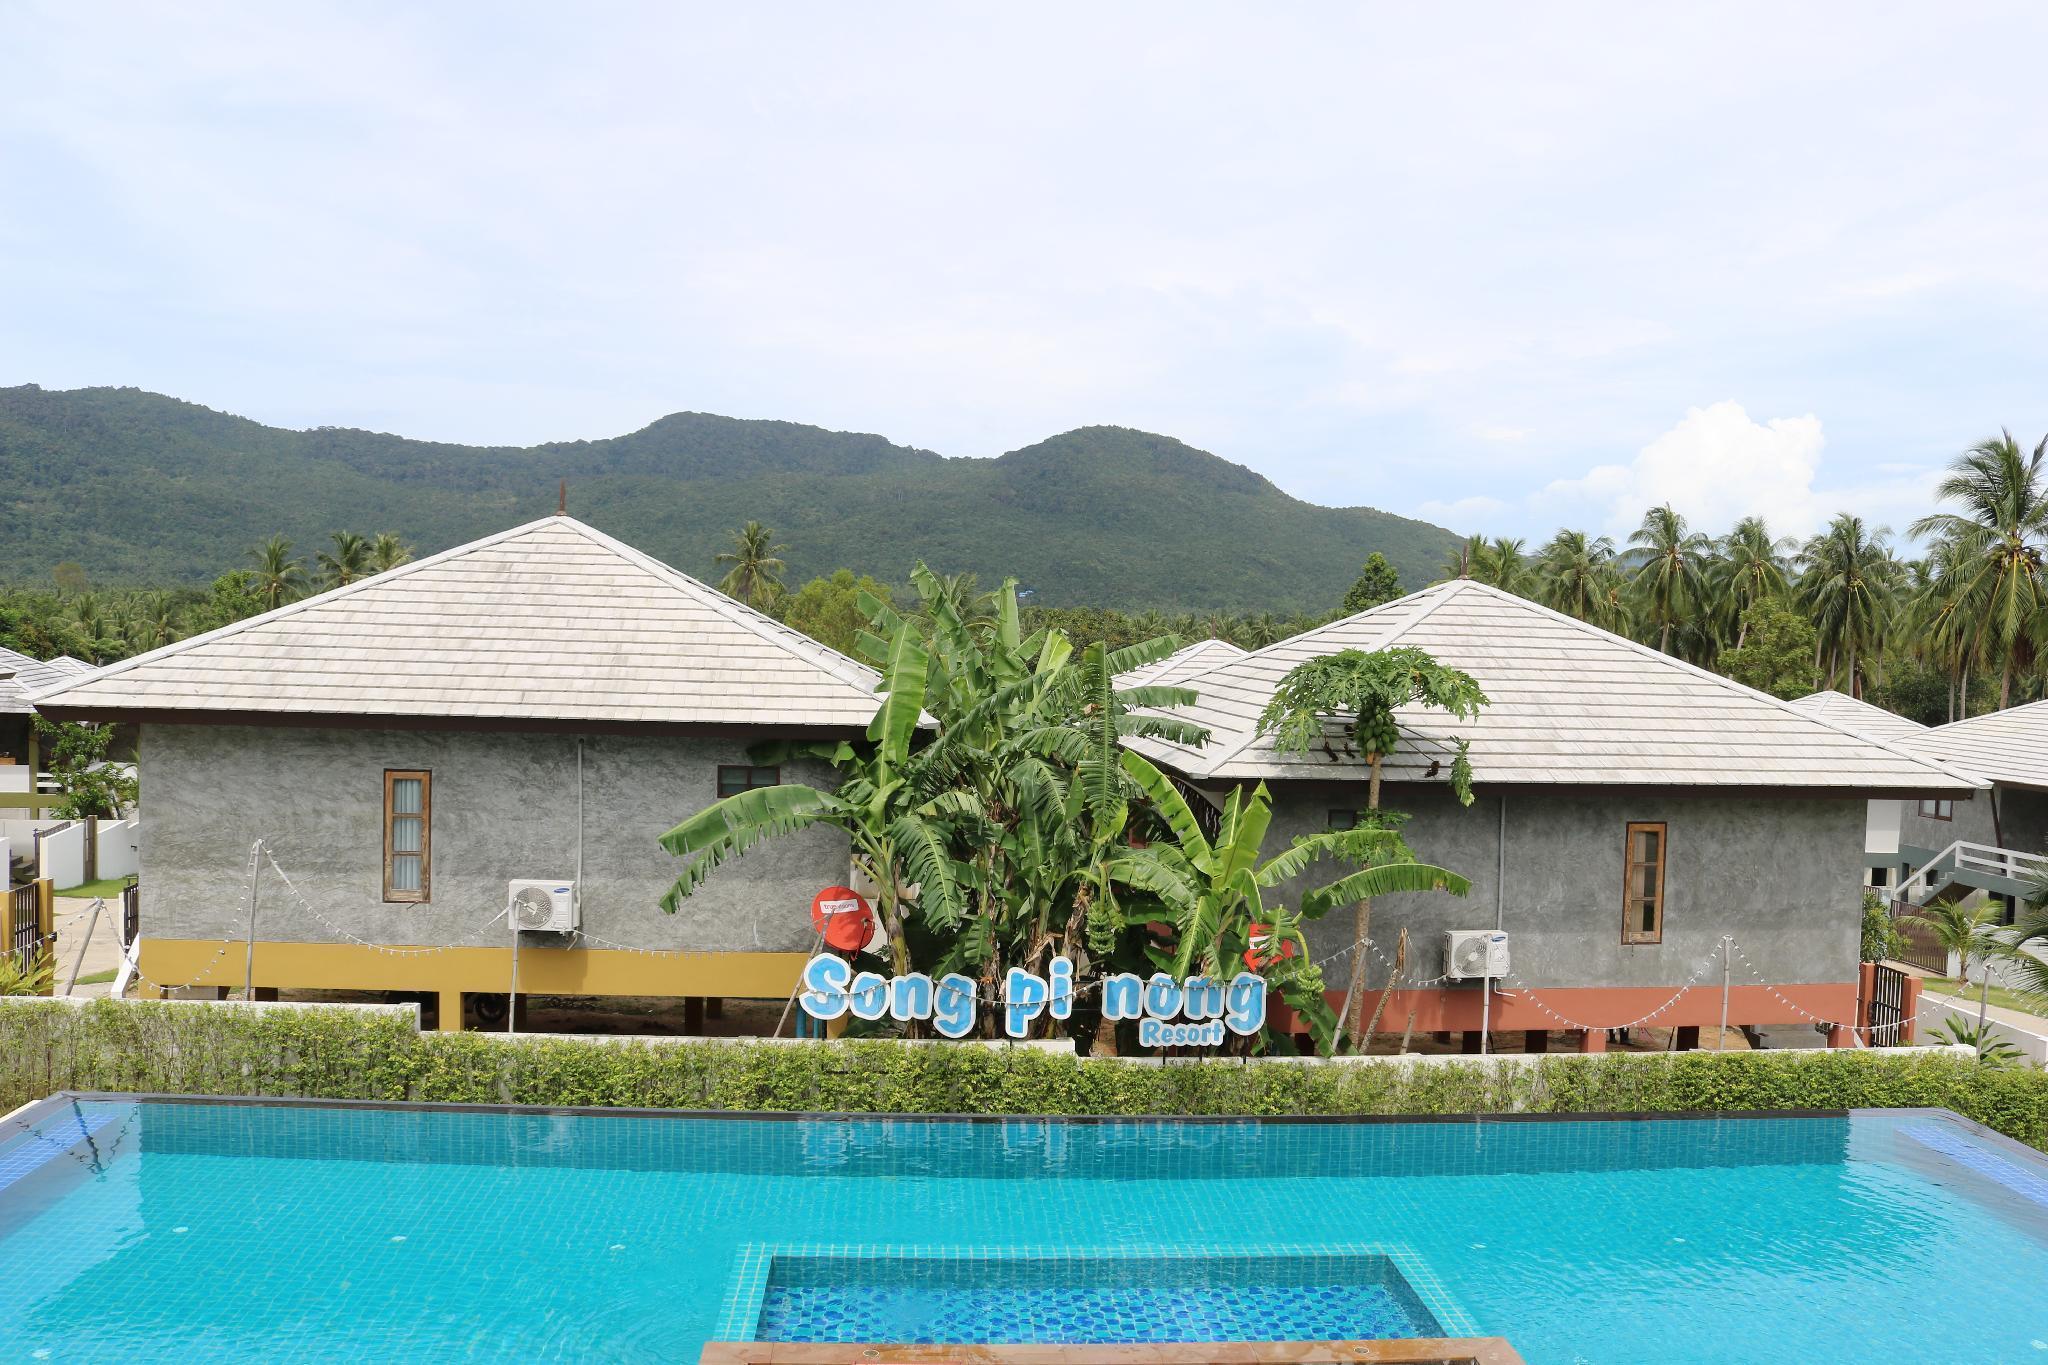 Song Phi Nong Resort Koh Phangan สองพี่น้องรีสอร์ท เกาะพะงัน